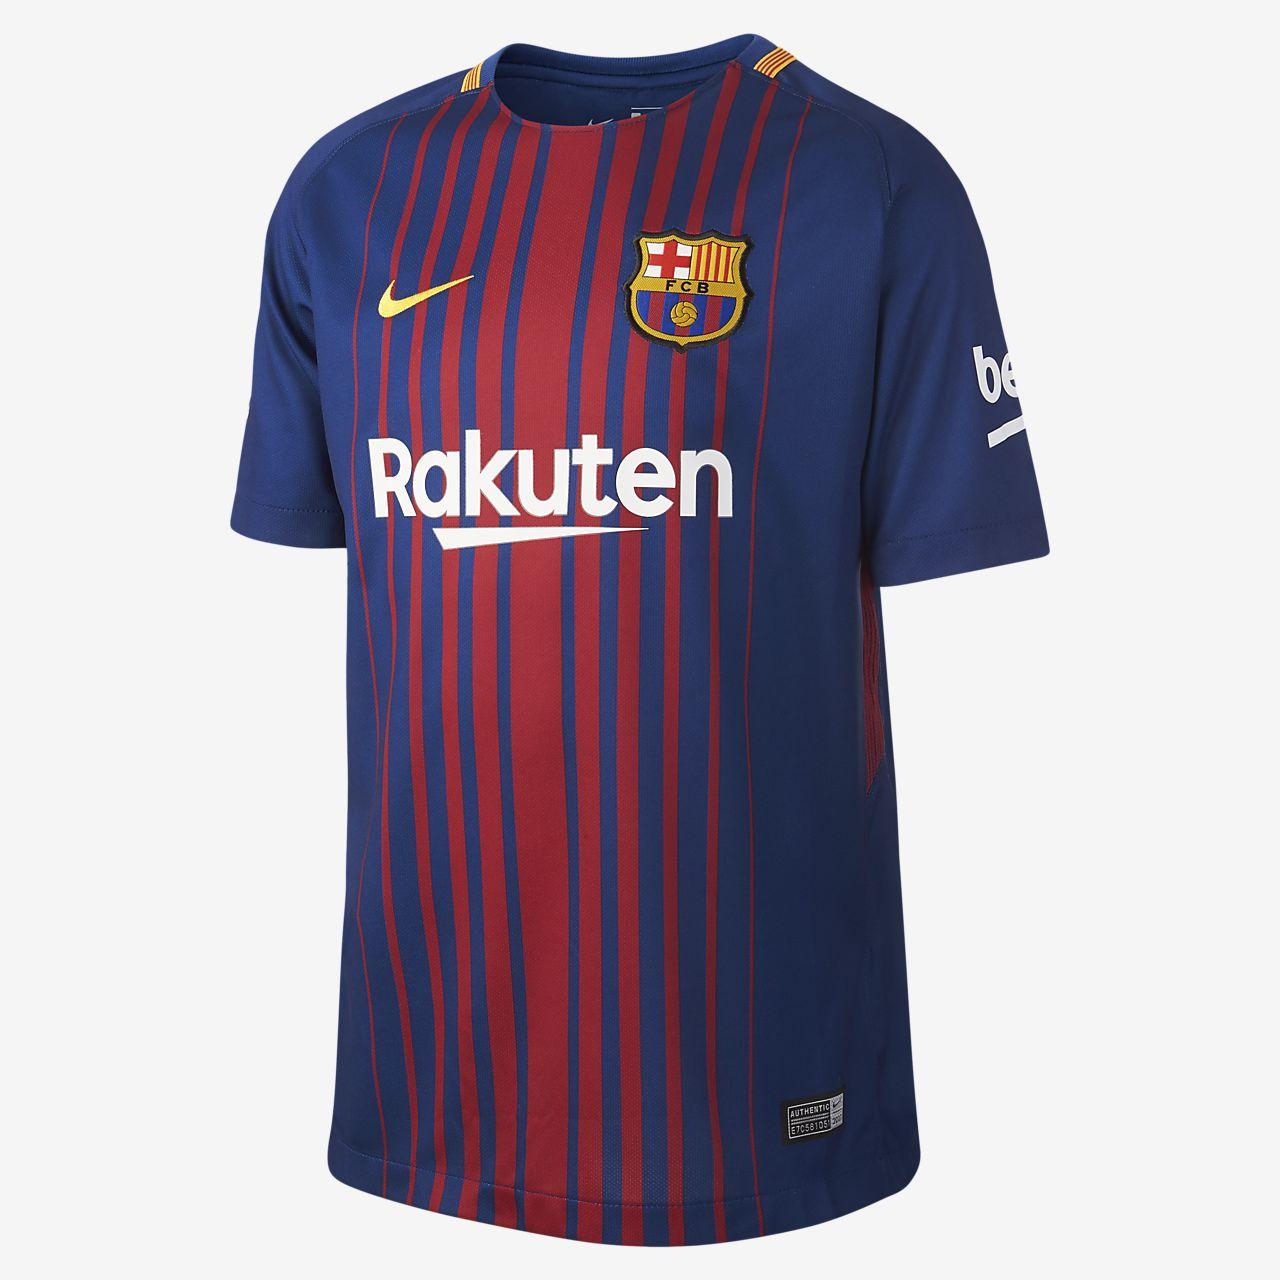 7f61dc866 Nike Luis Suarez Fc Barcelona - Querciacb